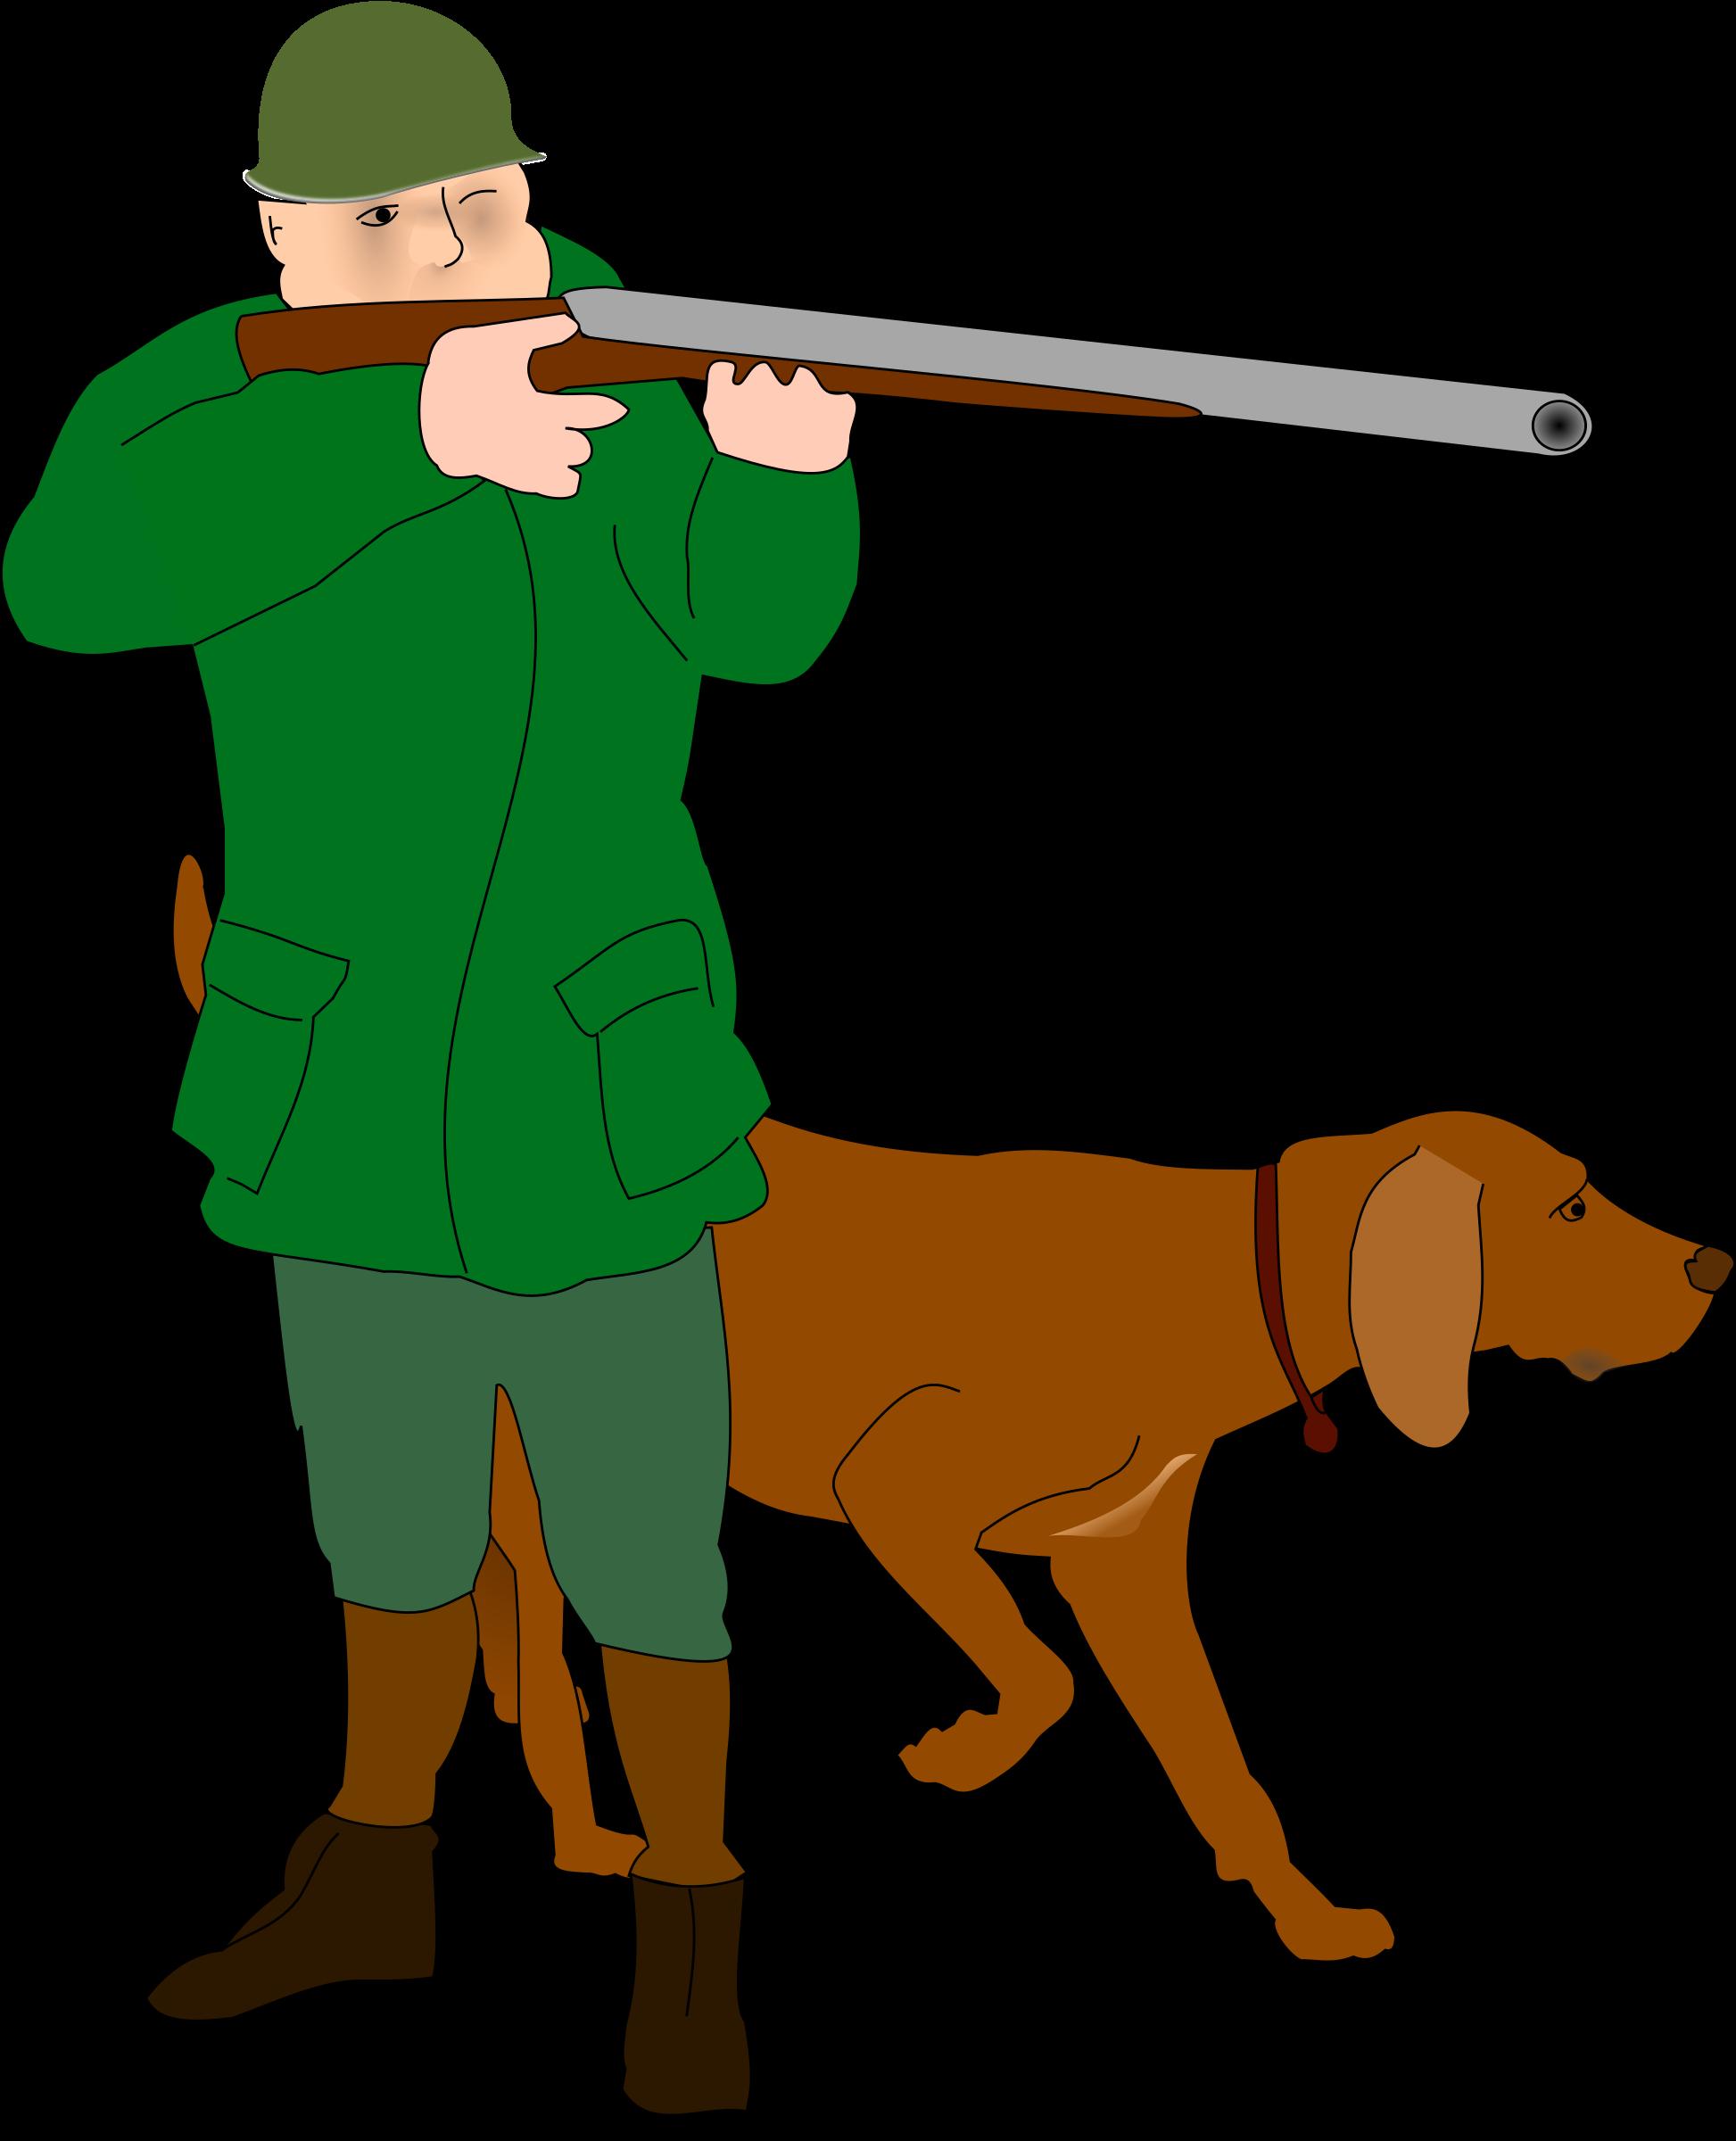 Hunter military helmet big. Hunting clipart target hunting